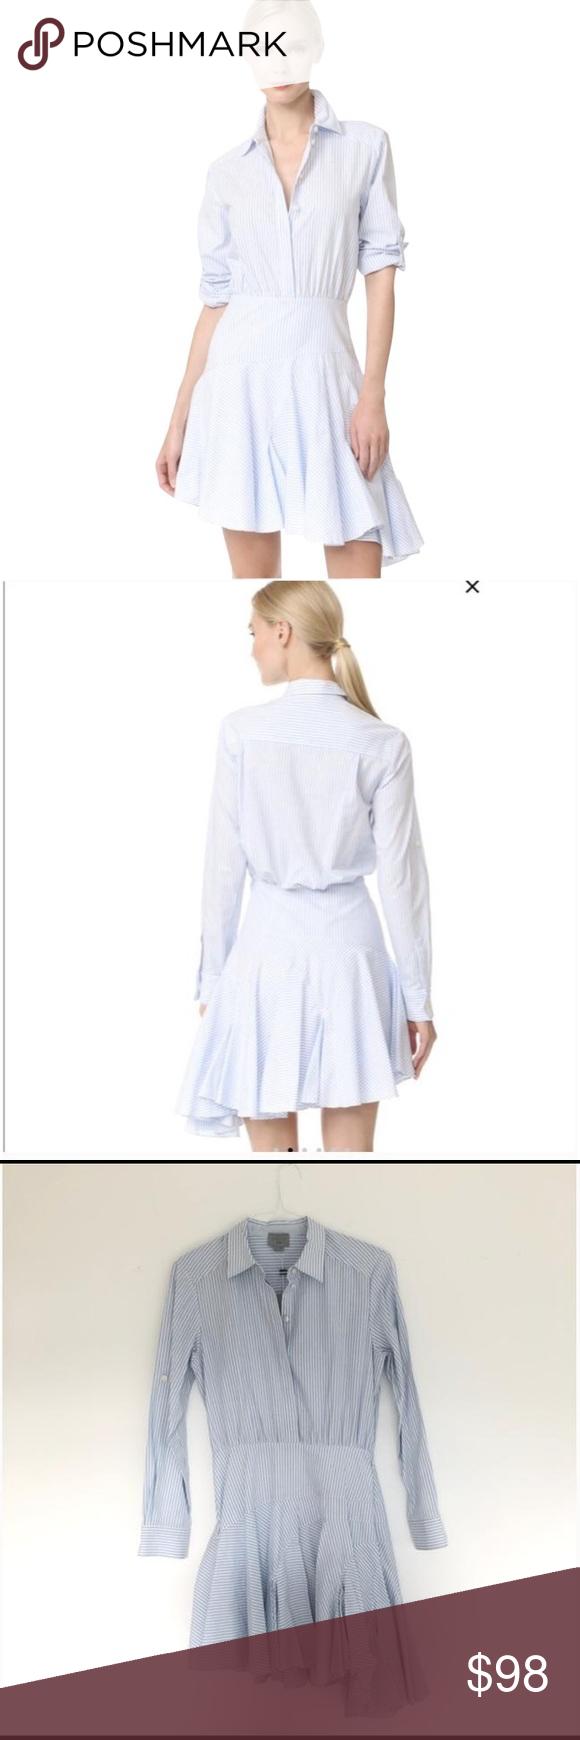 bec896db6b20 Jason Wu Striped Long Sleeve Asymmetrical Dress Jason Wu Blue Striped Long  Sleeve Asymmetrical Dress Size